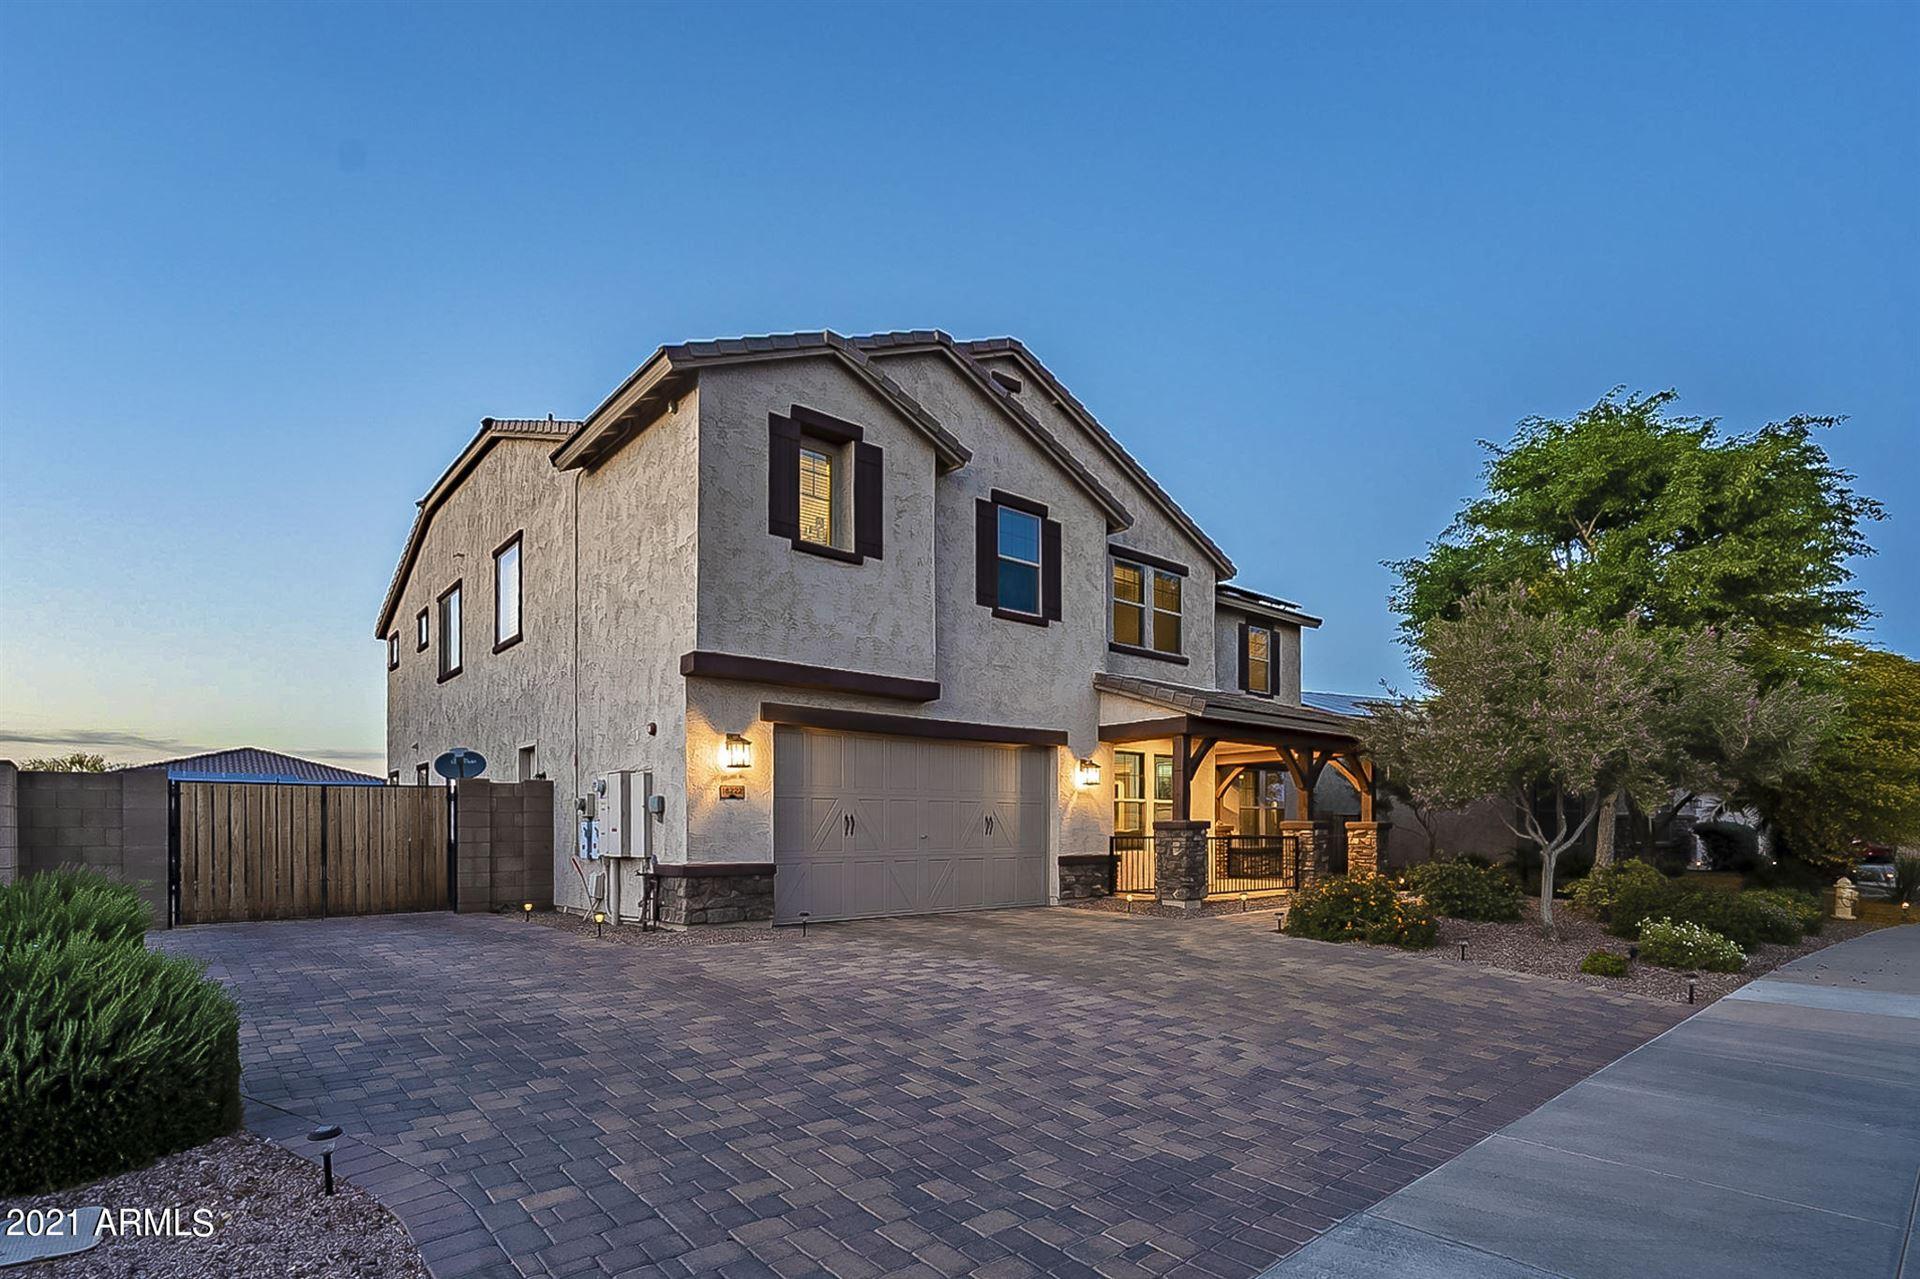 Photo of 18222 W MONTEROSA Street, Goodyear, AZ 85395 (MLS # 6232292)